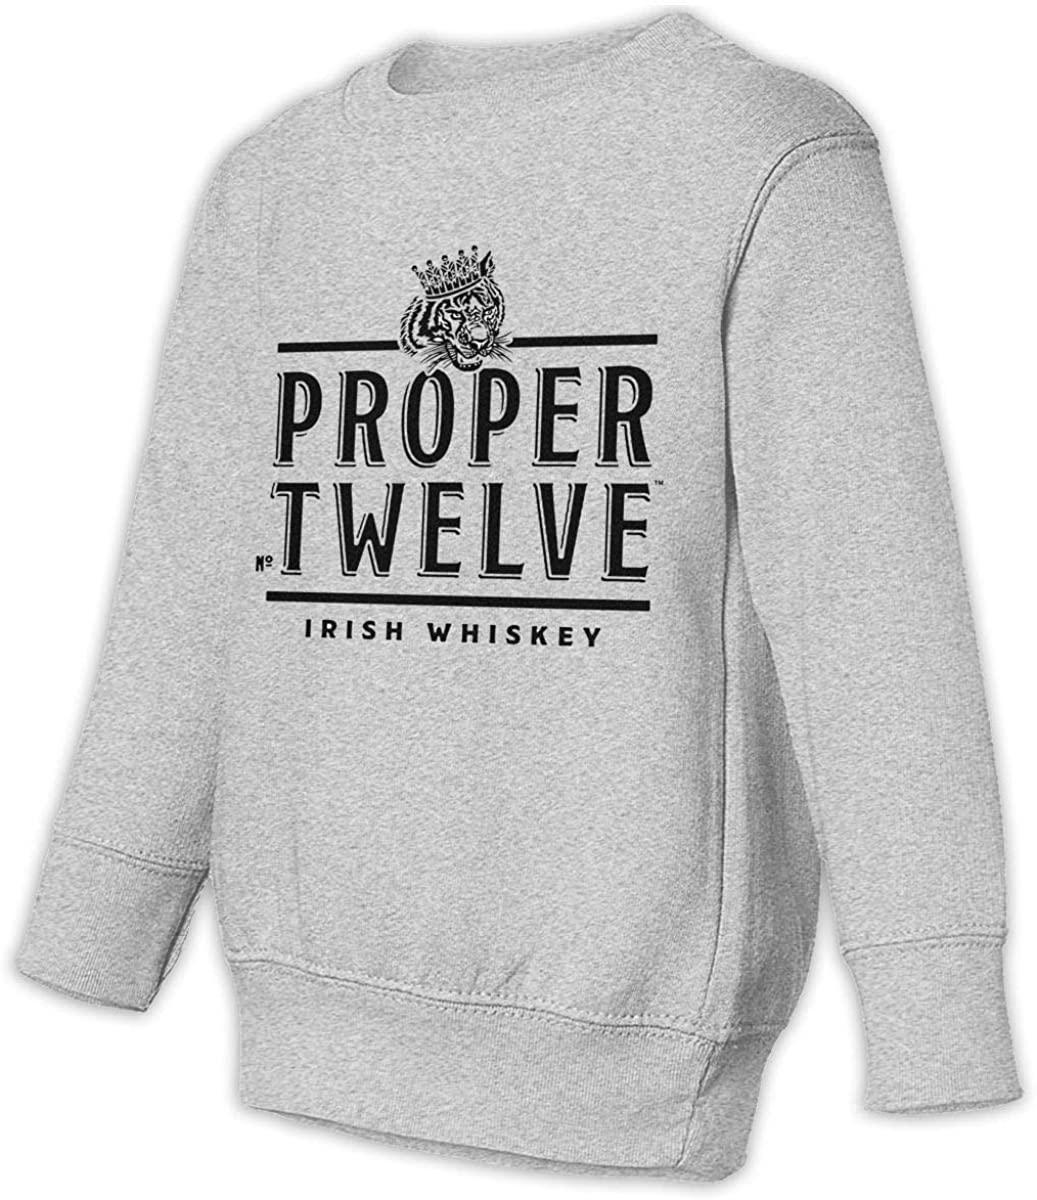 1836 Proper 12 Irish Whiskey Unisex Sweatshirt Youth Boy and Girls Pullover Sweatshirt